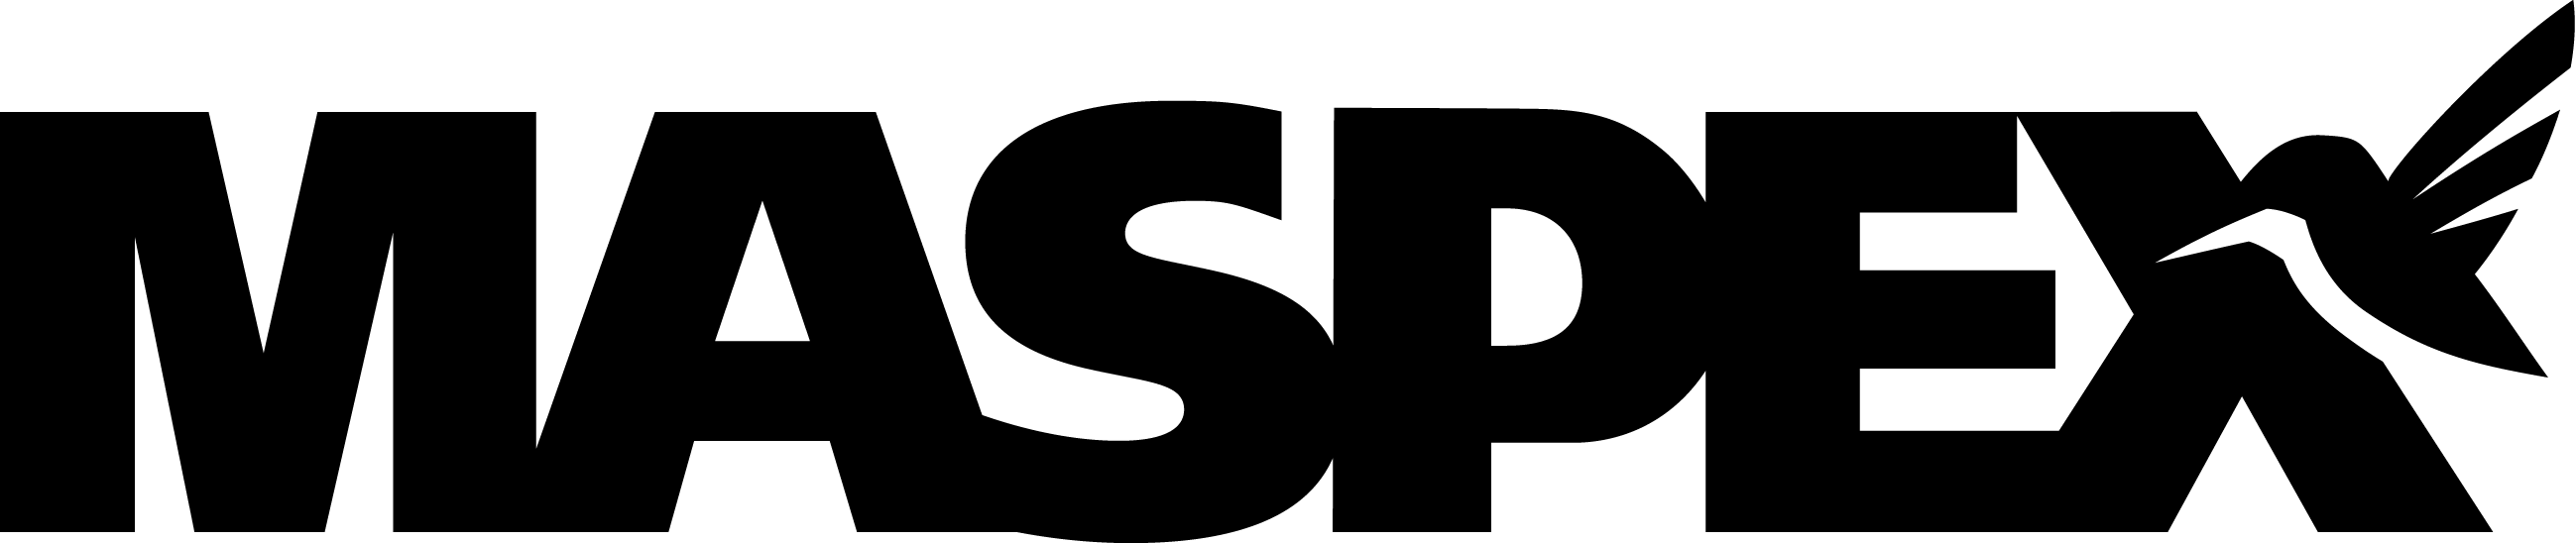 Logo - maspex